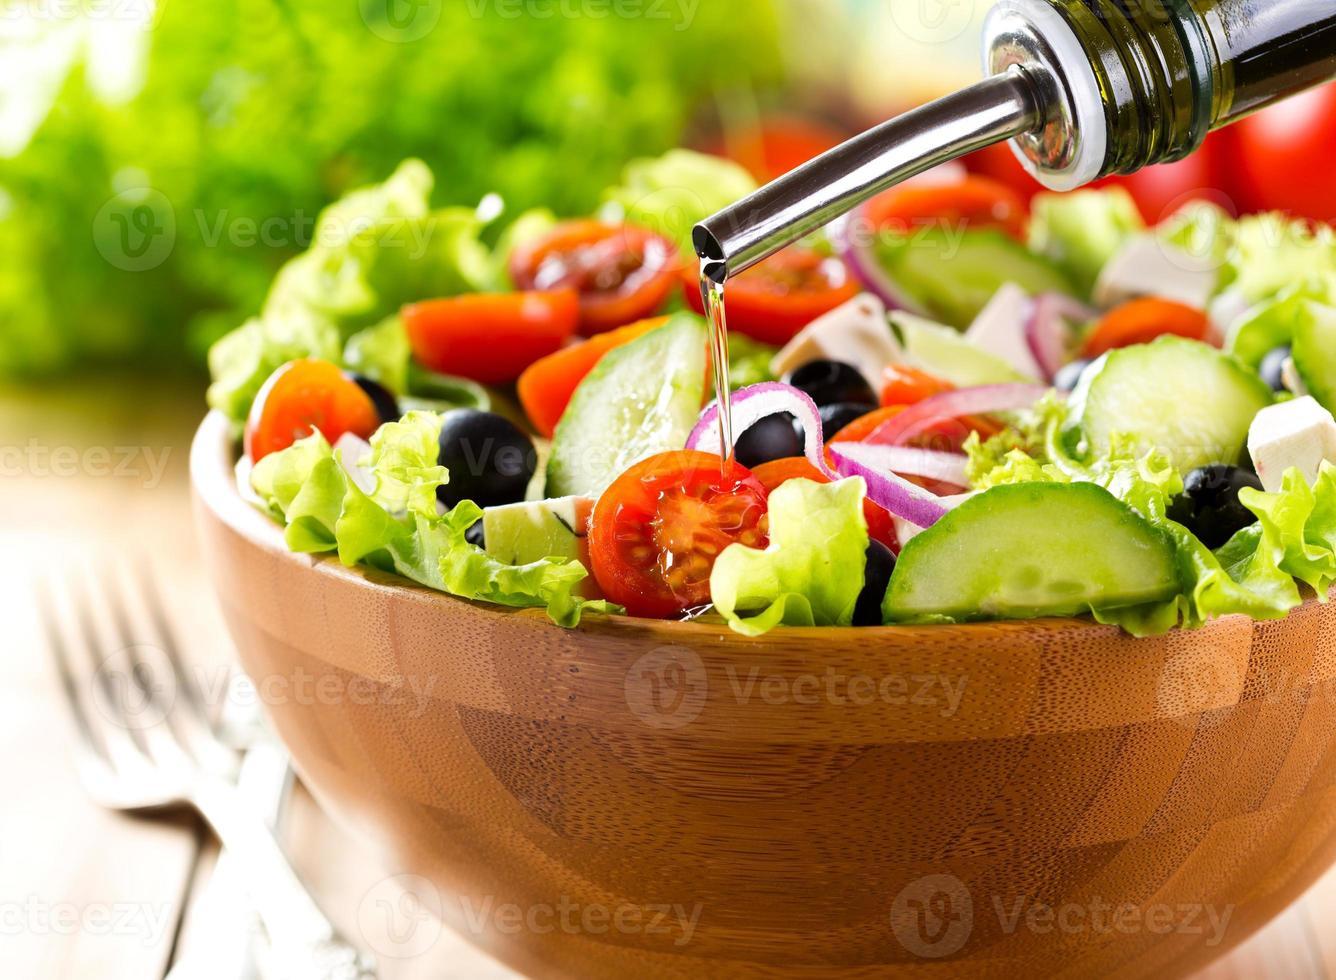 olie gieten in kom groentesalade foto